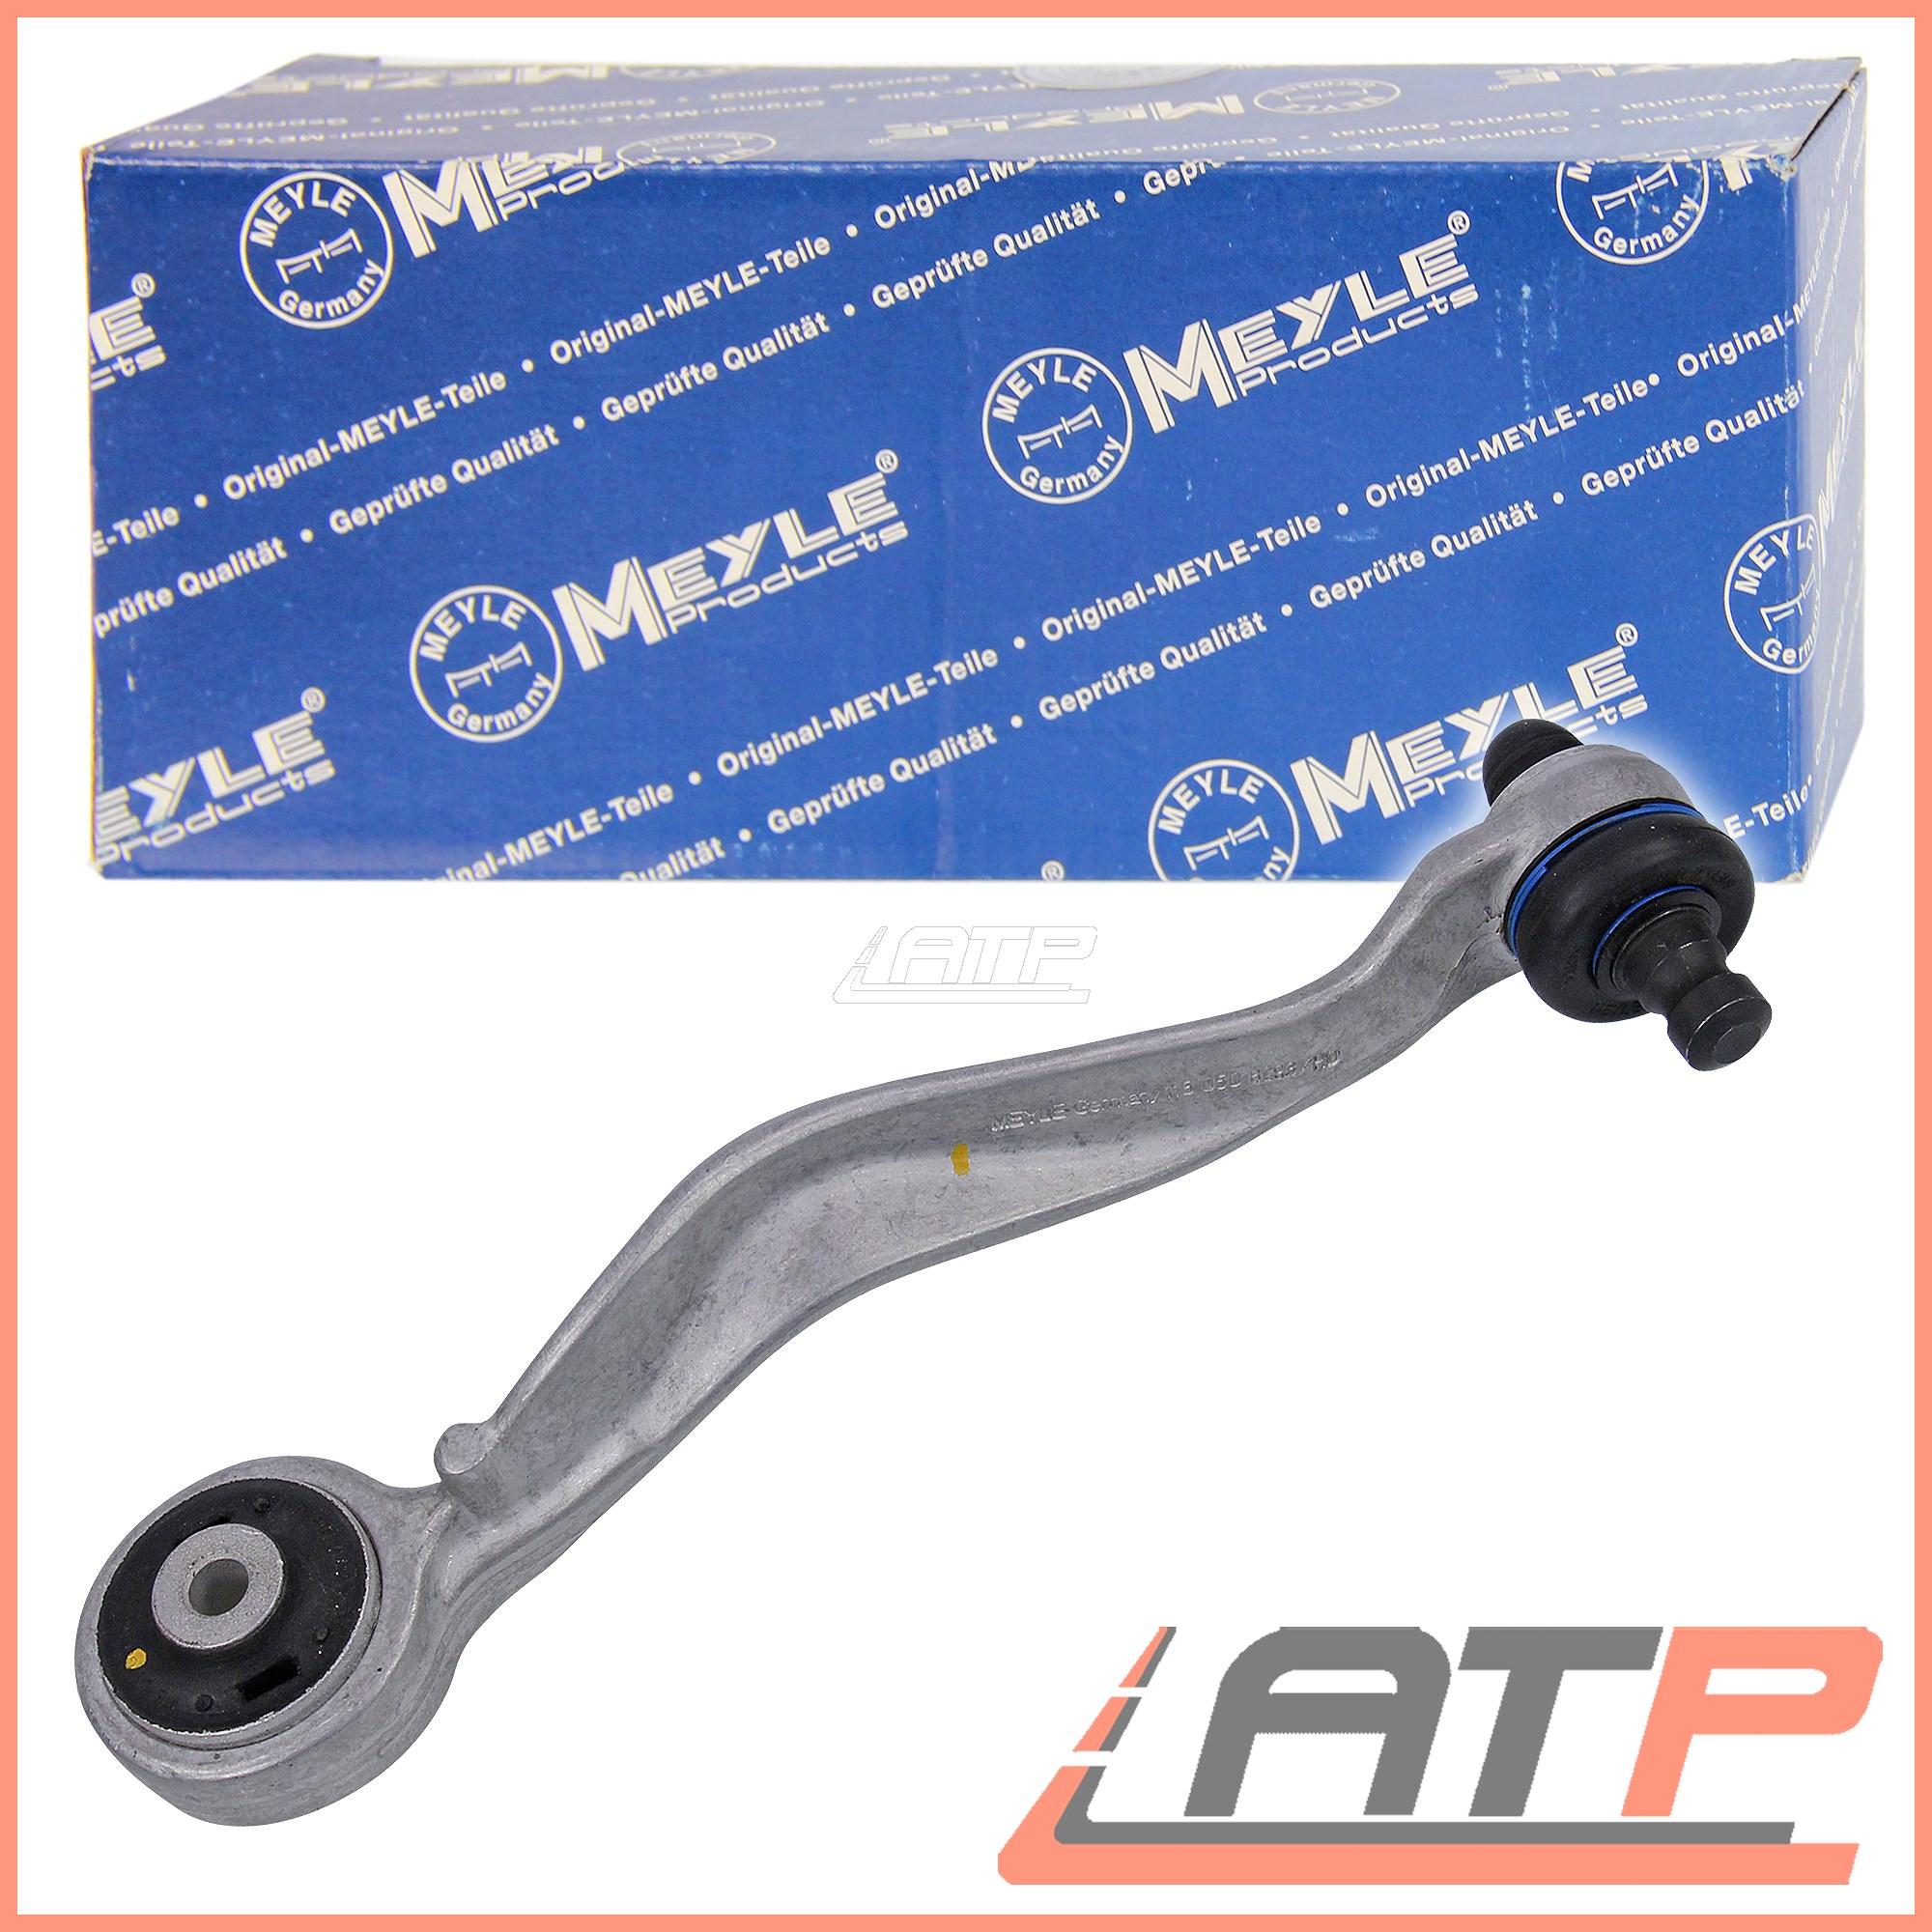 1x MEYLE HD SUSPENSION CONTROL ARM RIGHT FRONT UPPER REAR AUDI A4 8E B7 04-08